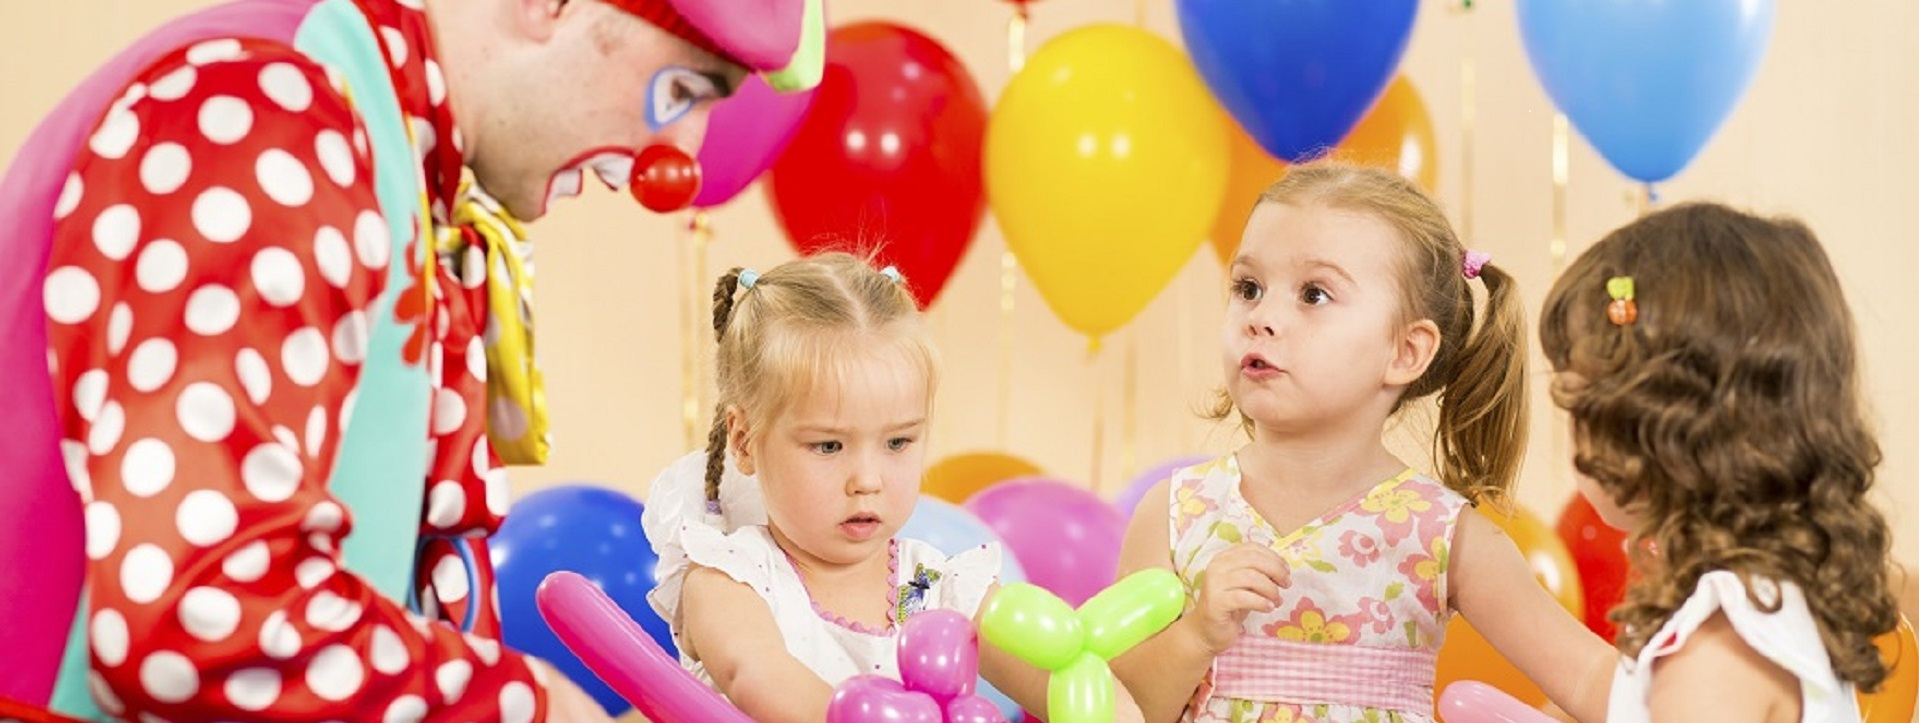 Children's party rooms